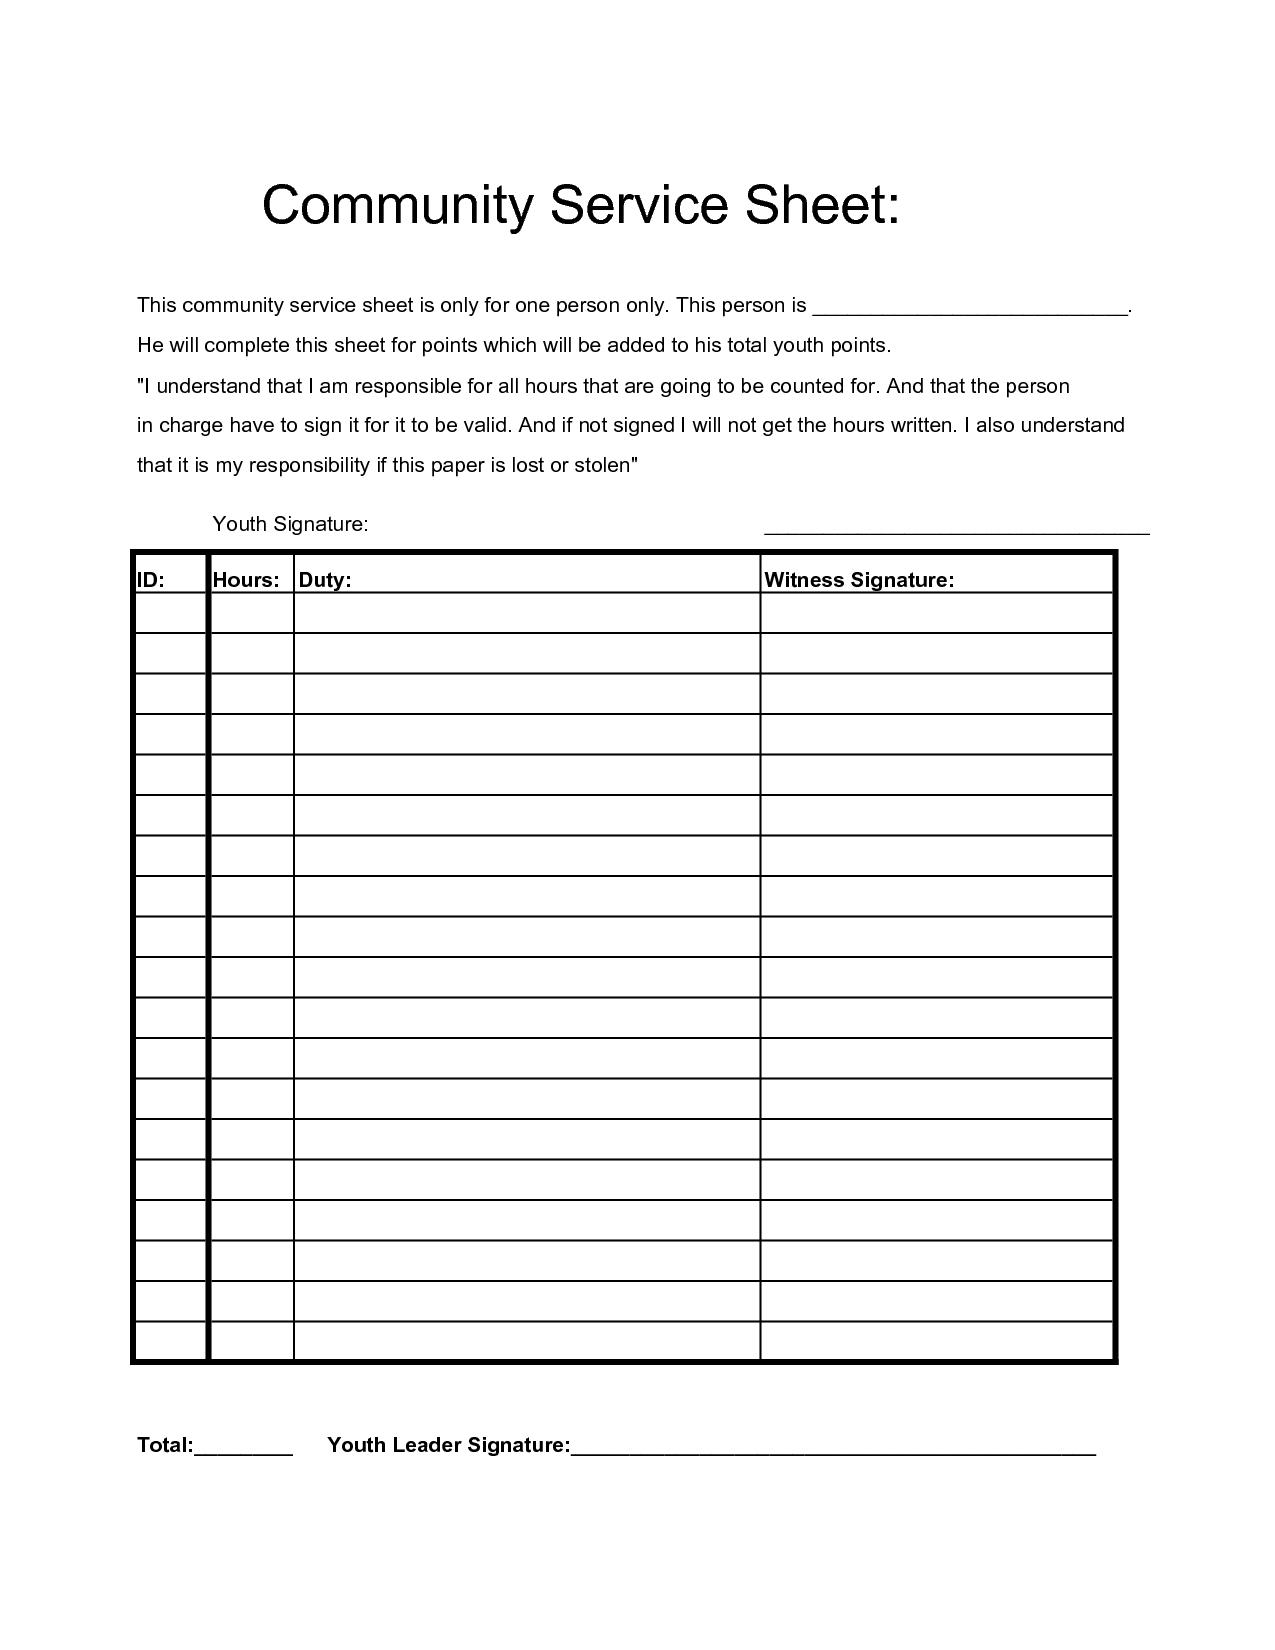 Community Service Hours Sheet